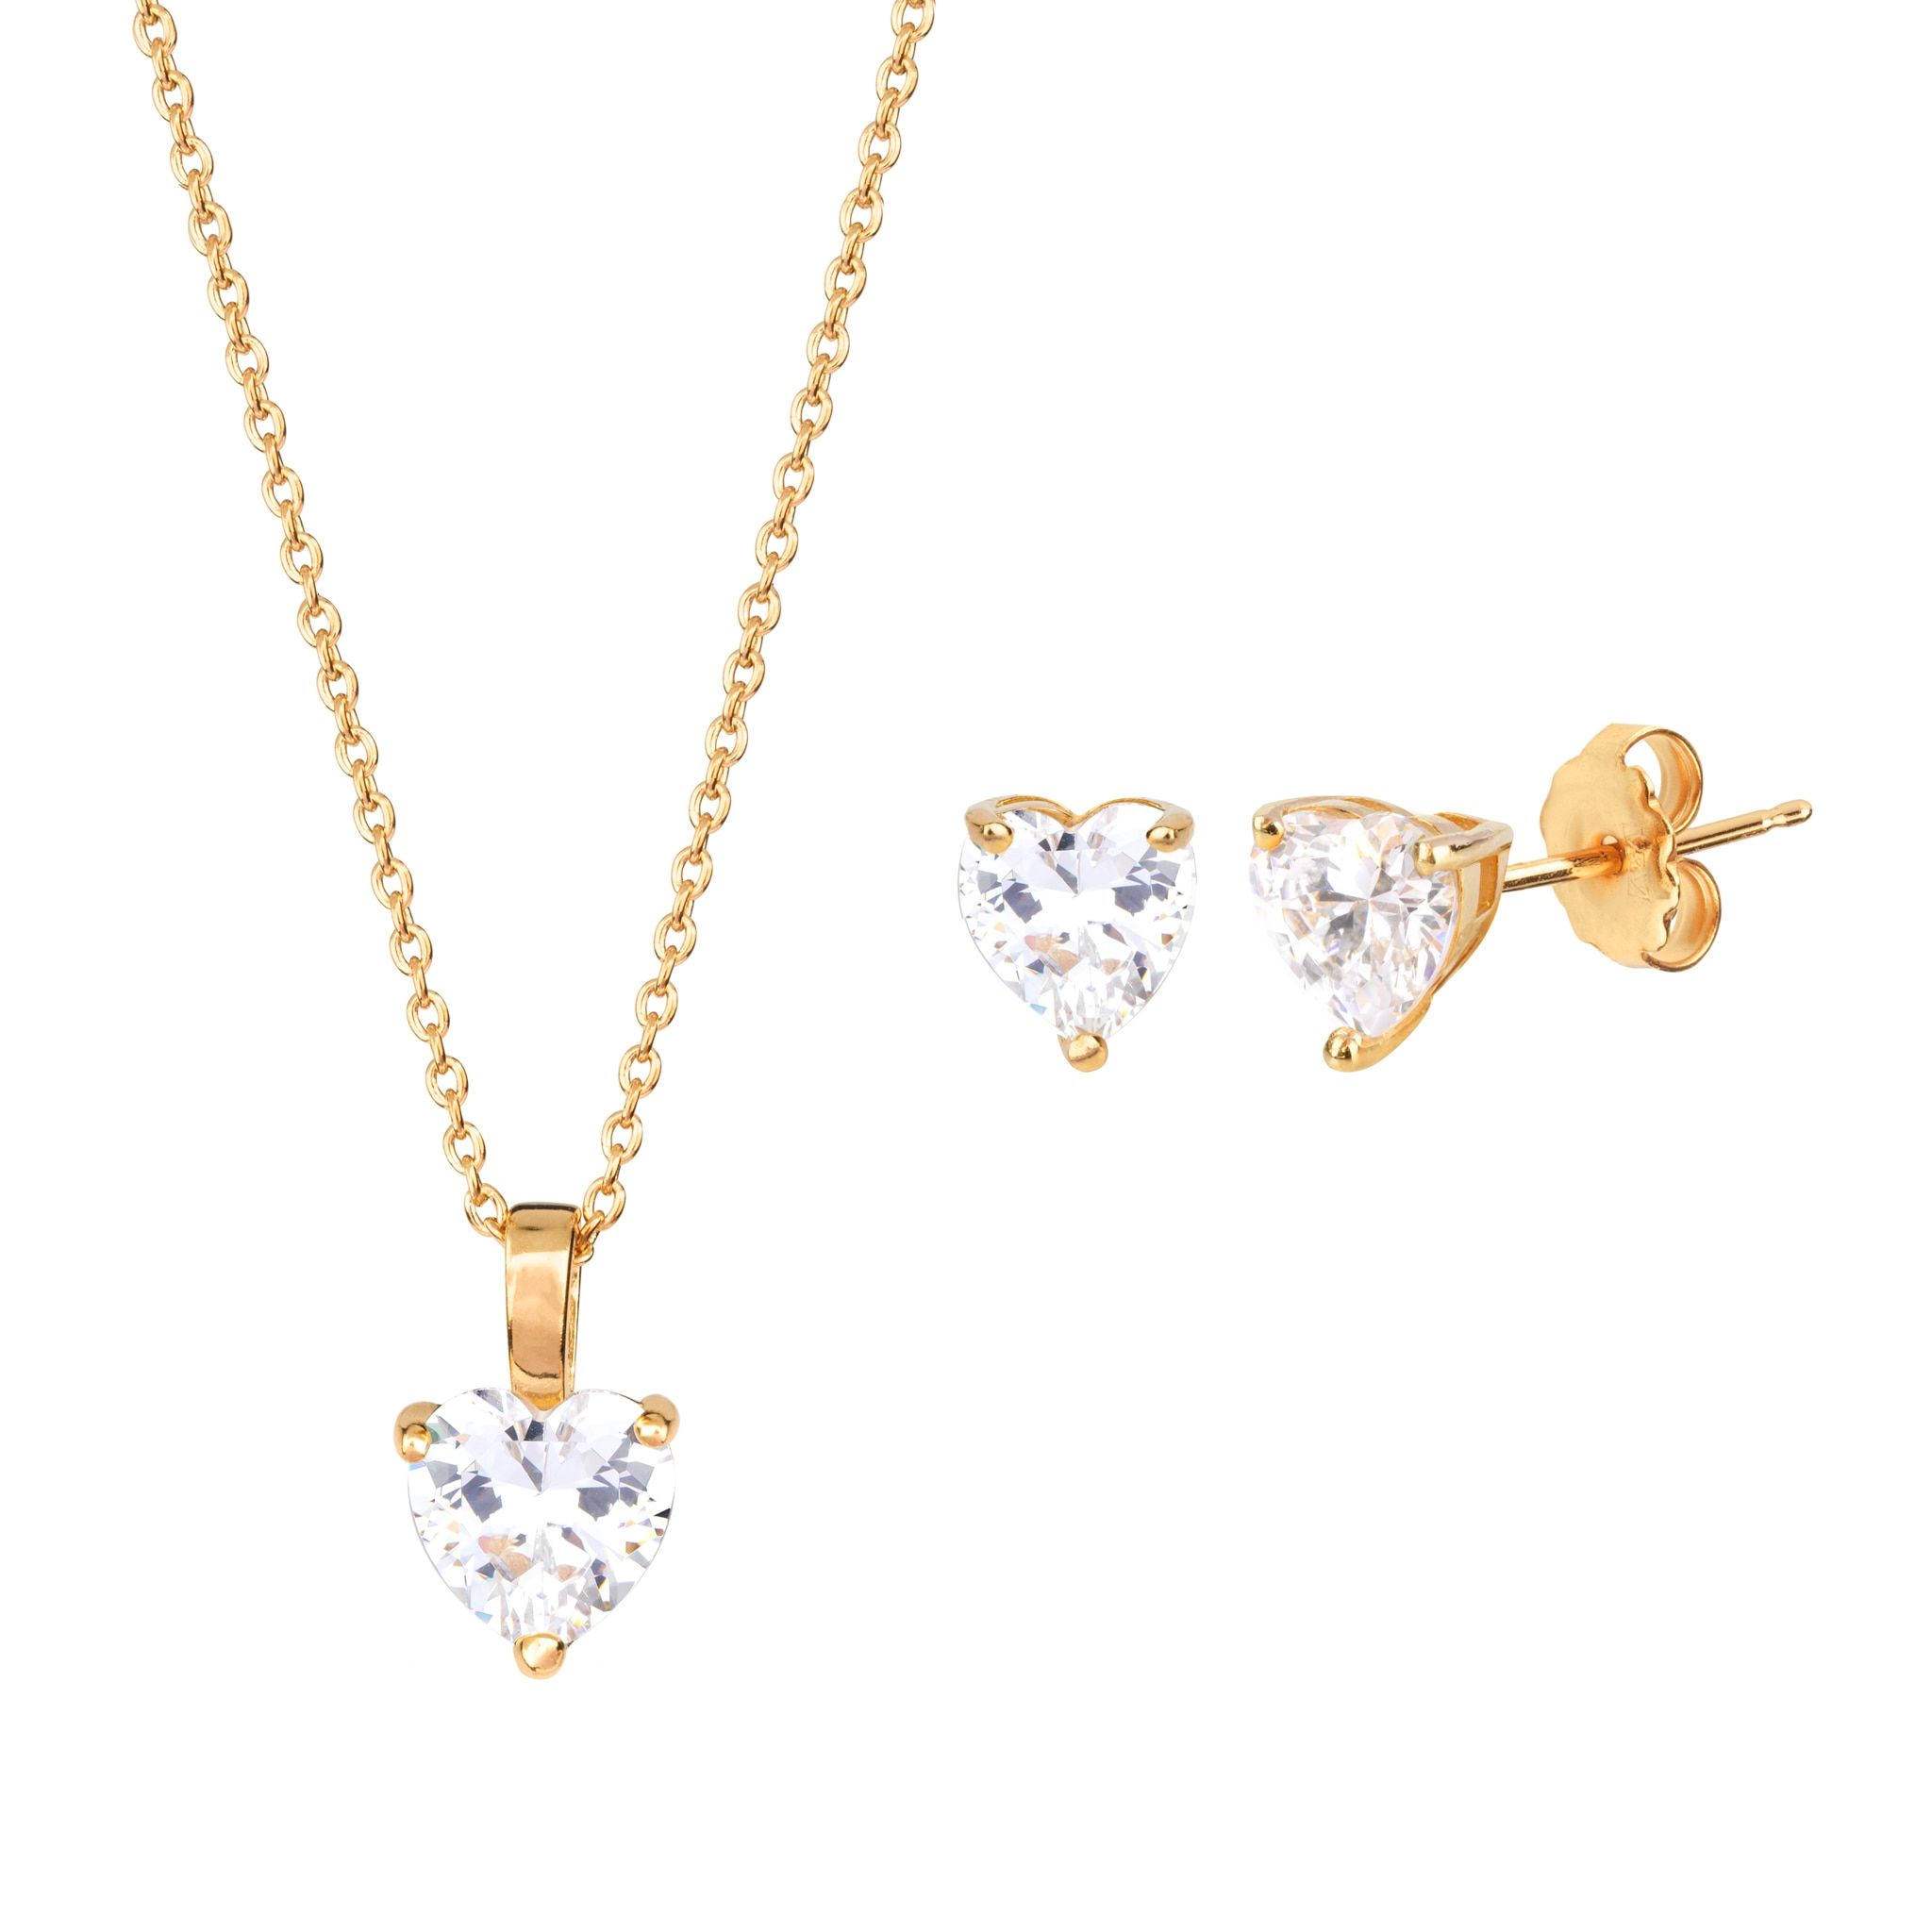 Heart pendant and earrings